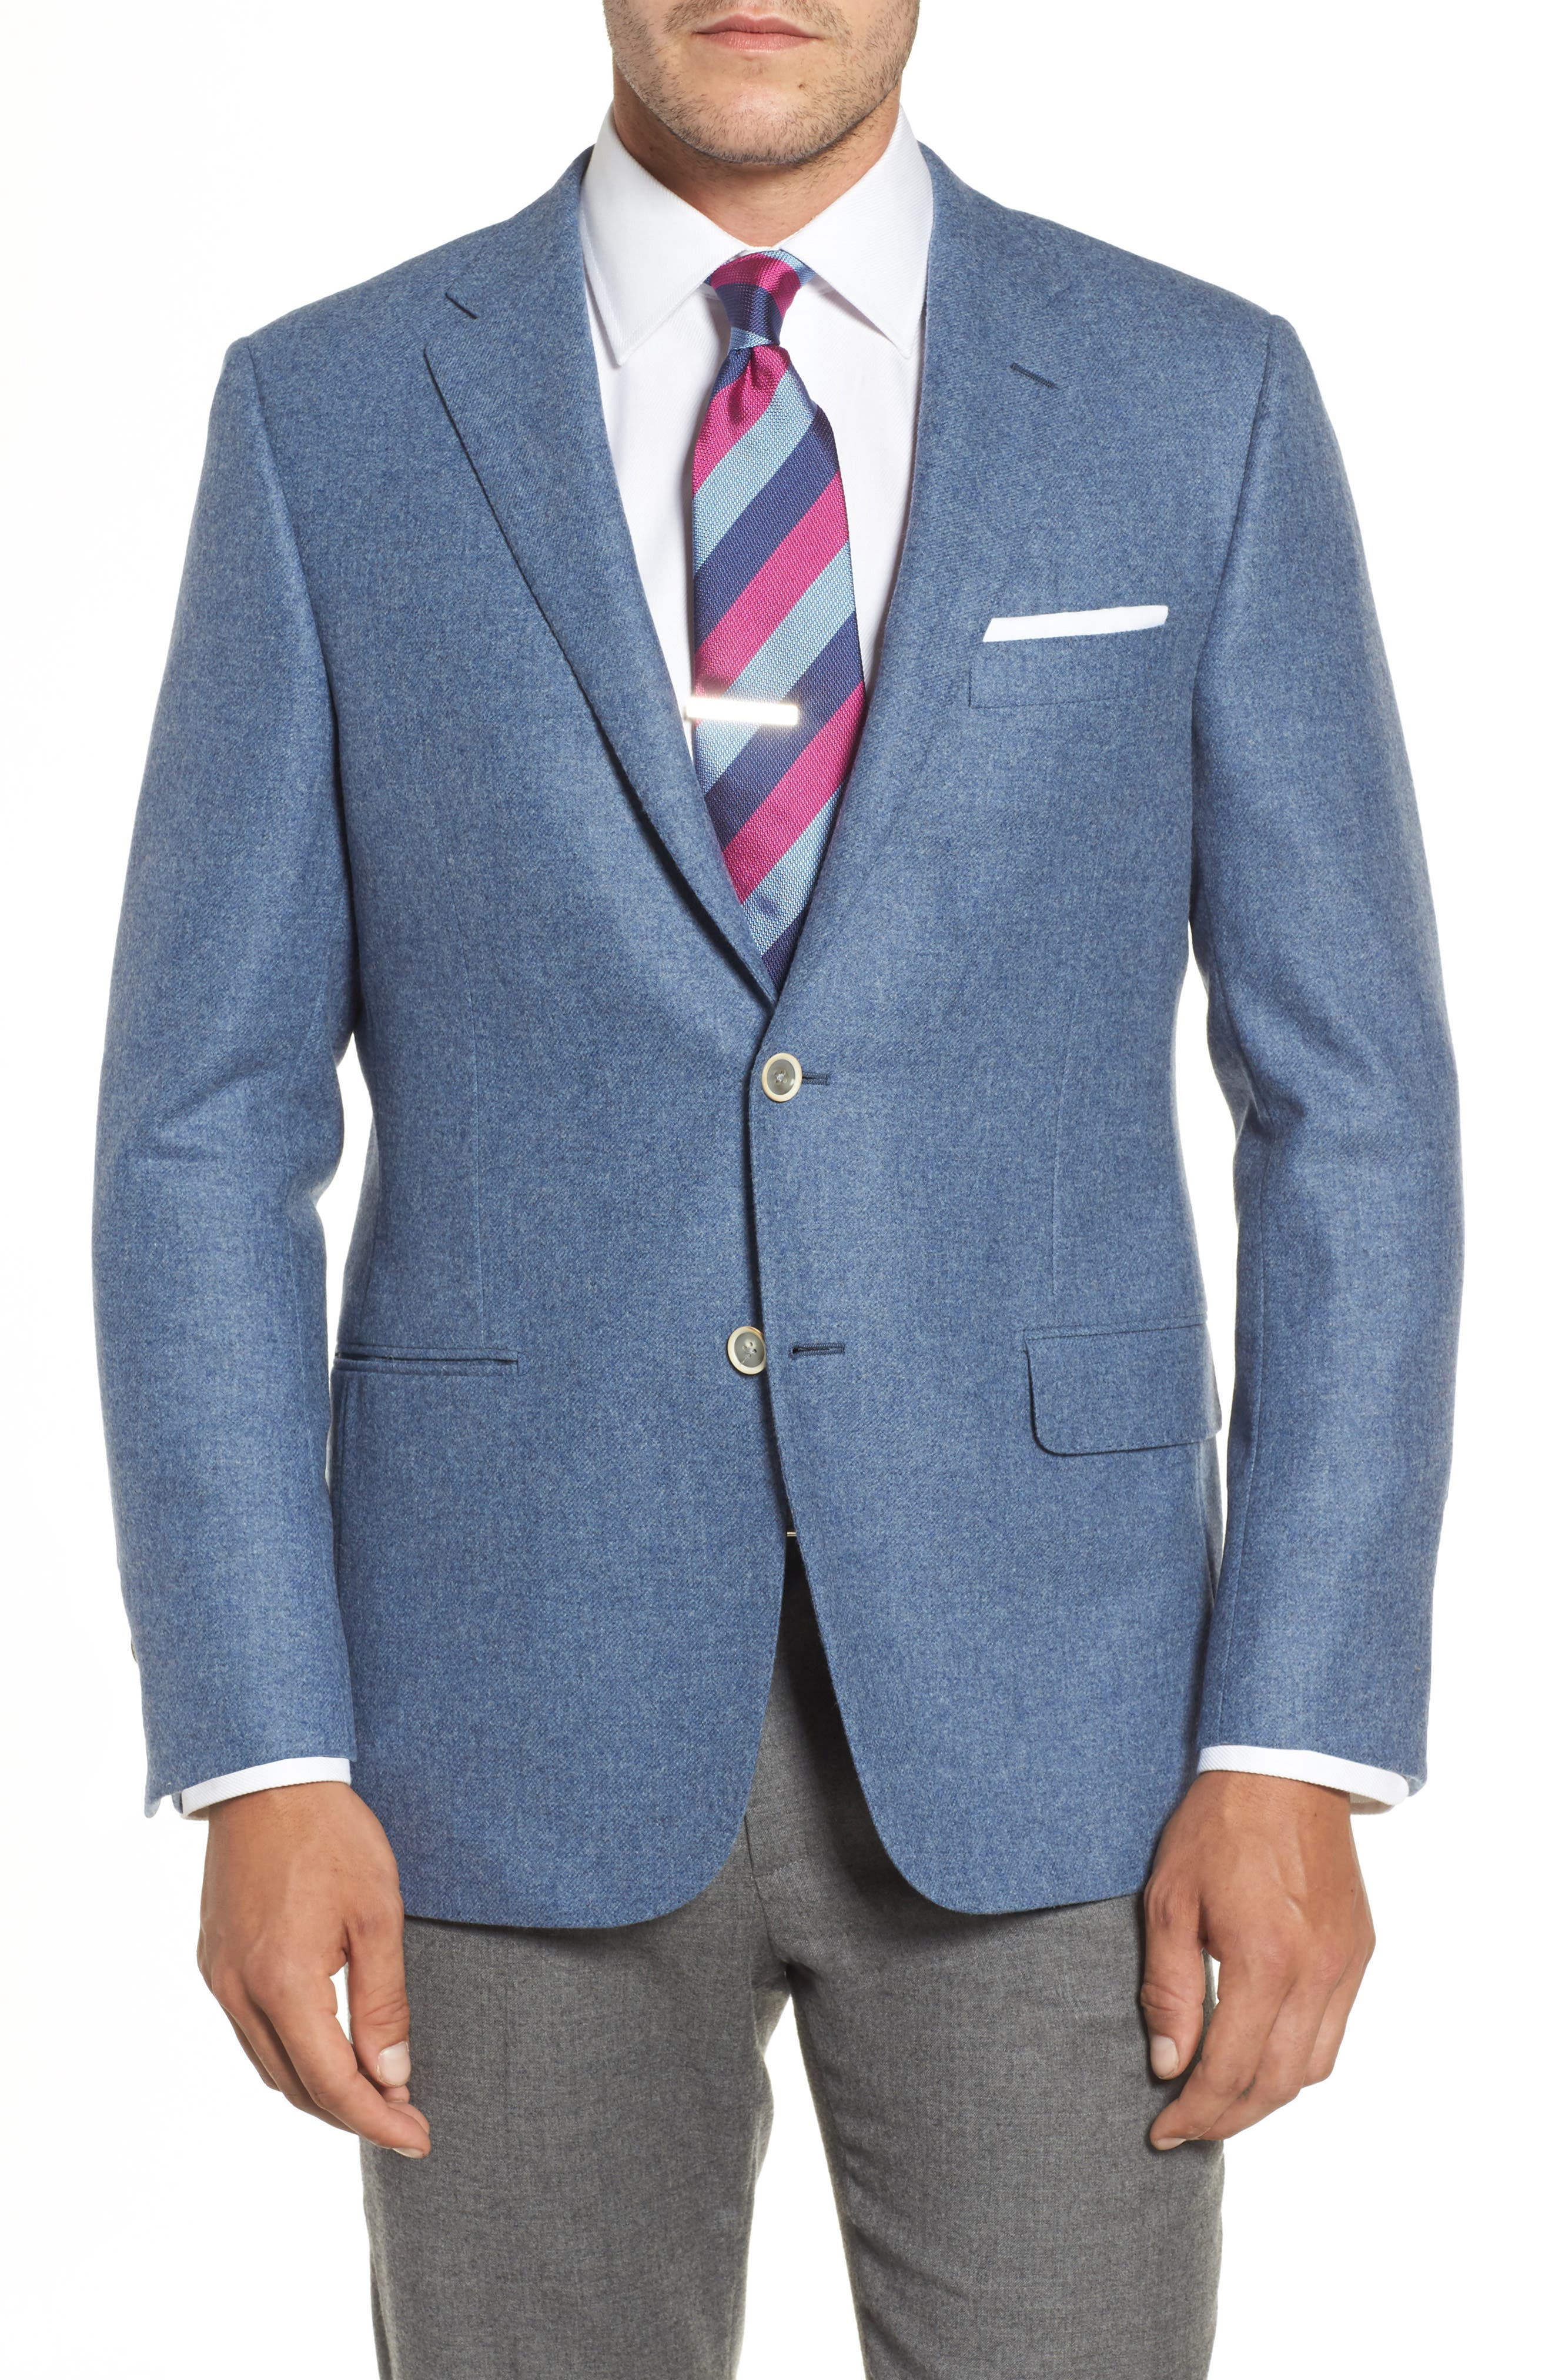 Beacon Classic Fit Wool & Cashmere Blazer,                             Main thumbnail 1, color,                             450